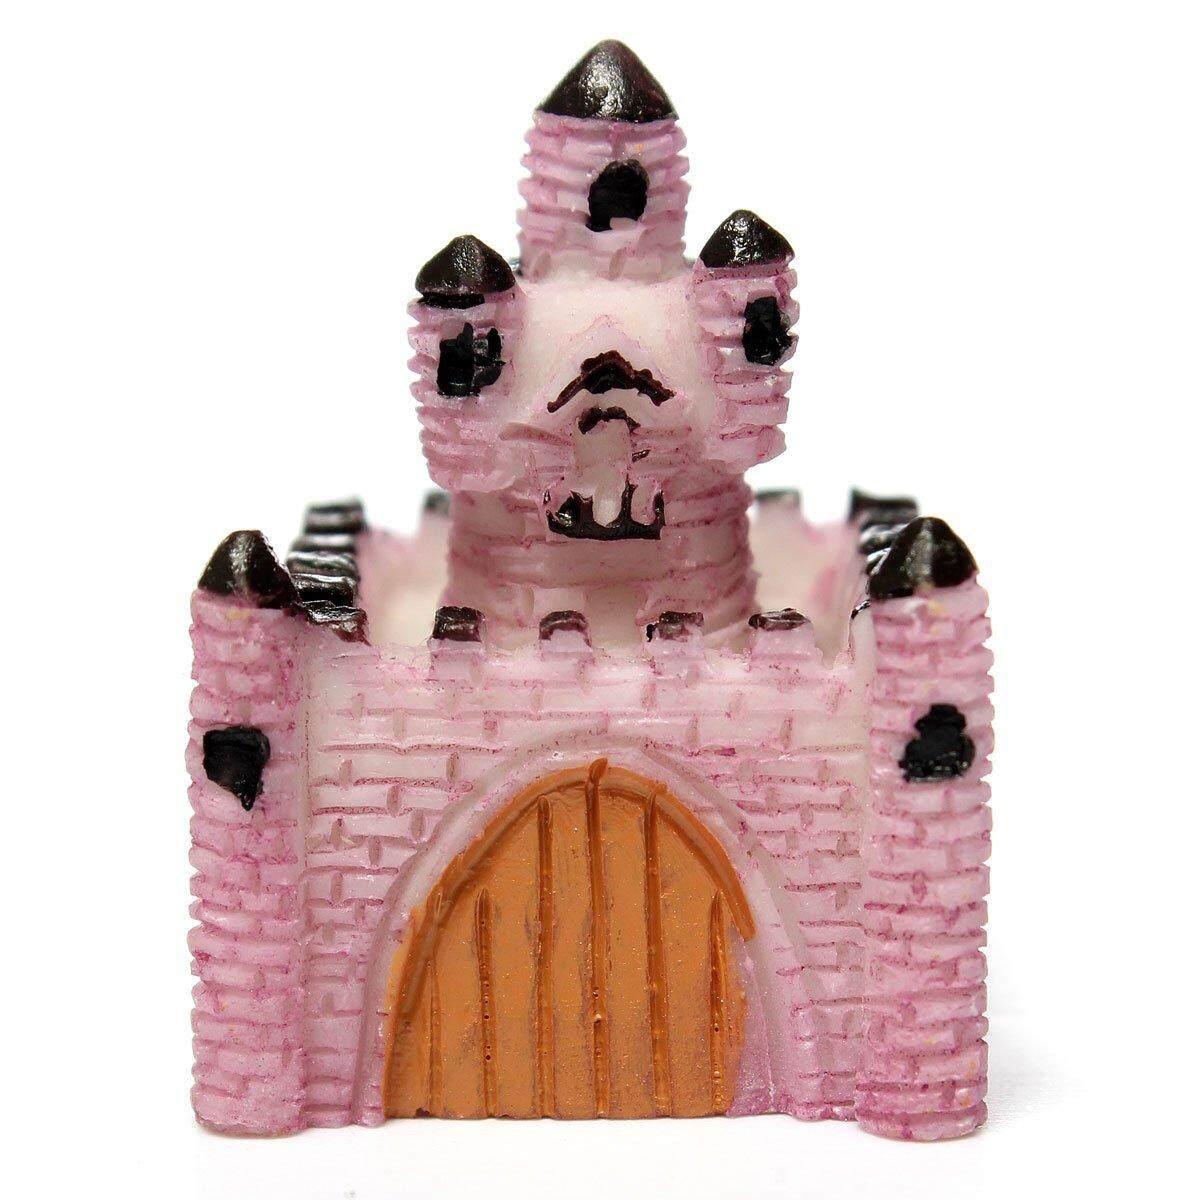 Miniature Resin Villa House Dollhouse Garden Fairy Ornament Pot Plant Craft Home Decor Light Pink - intl